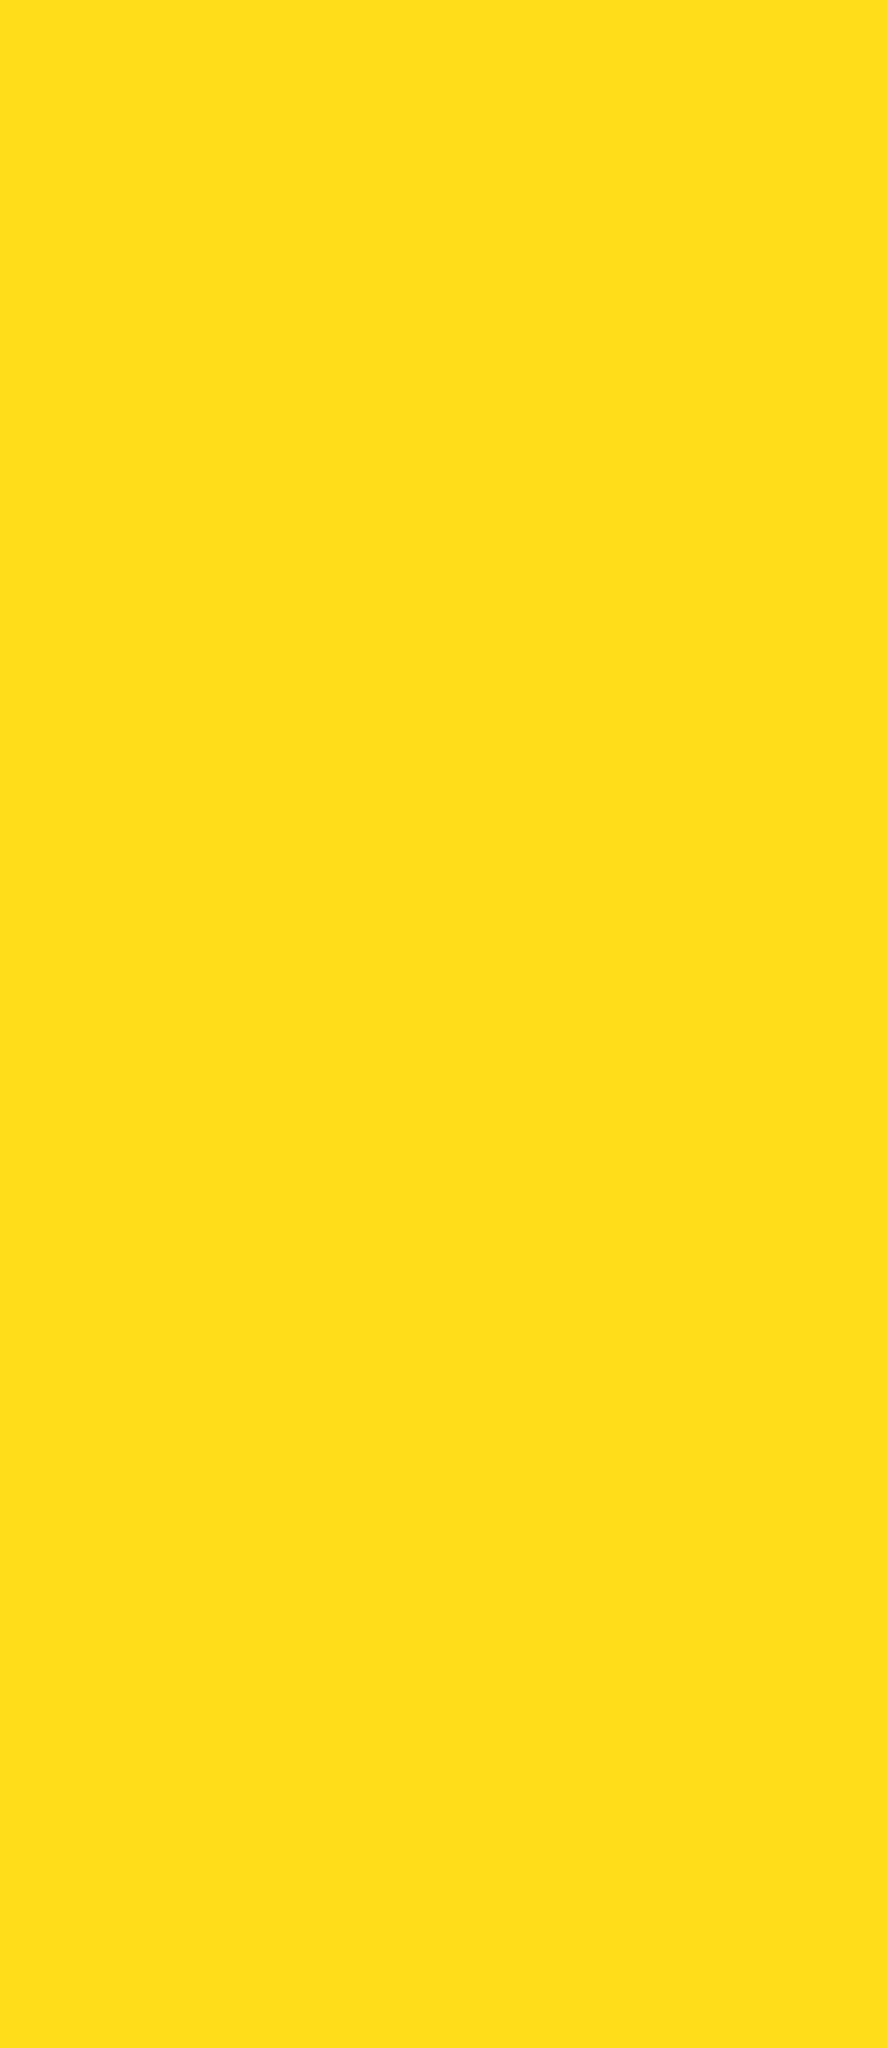 D483 YELLOW